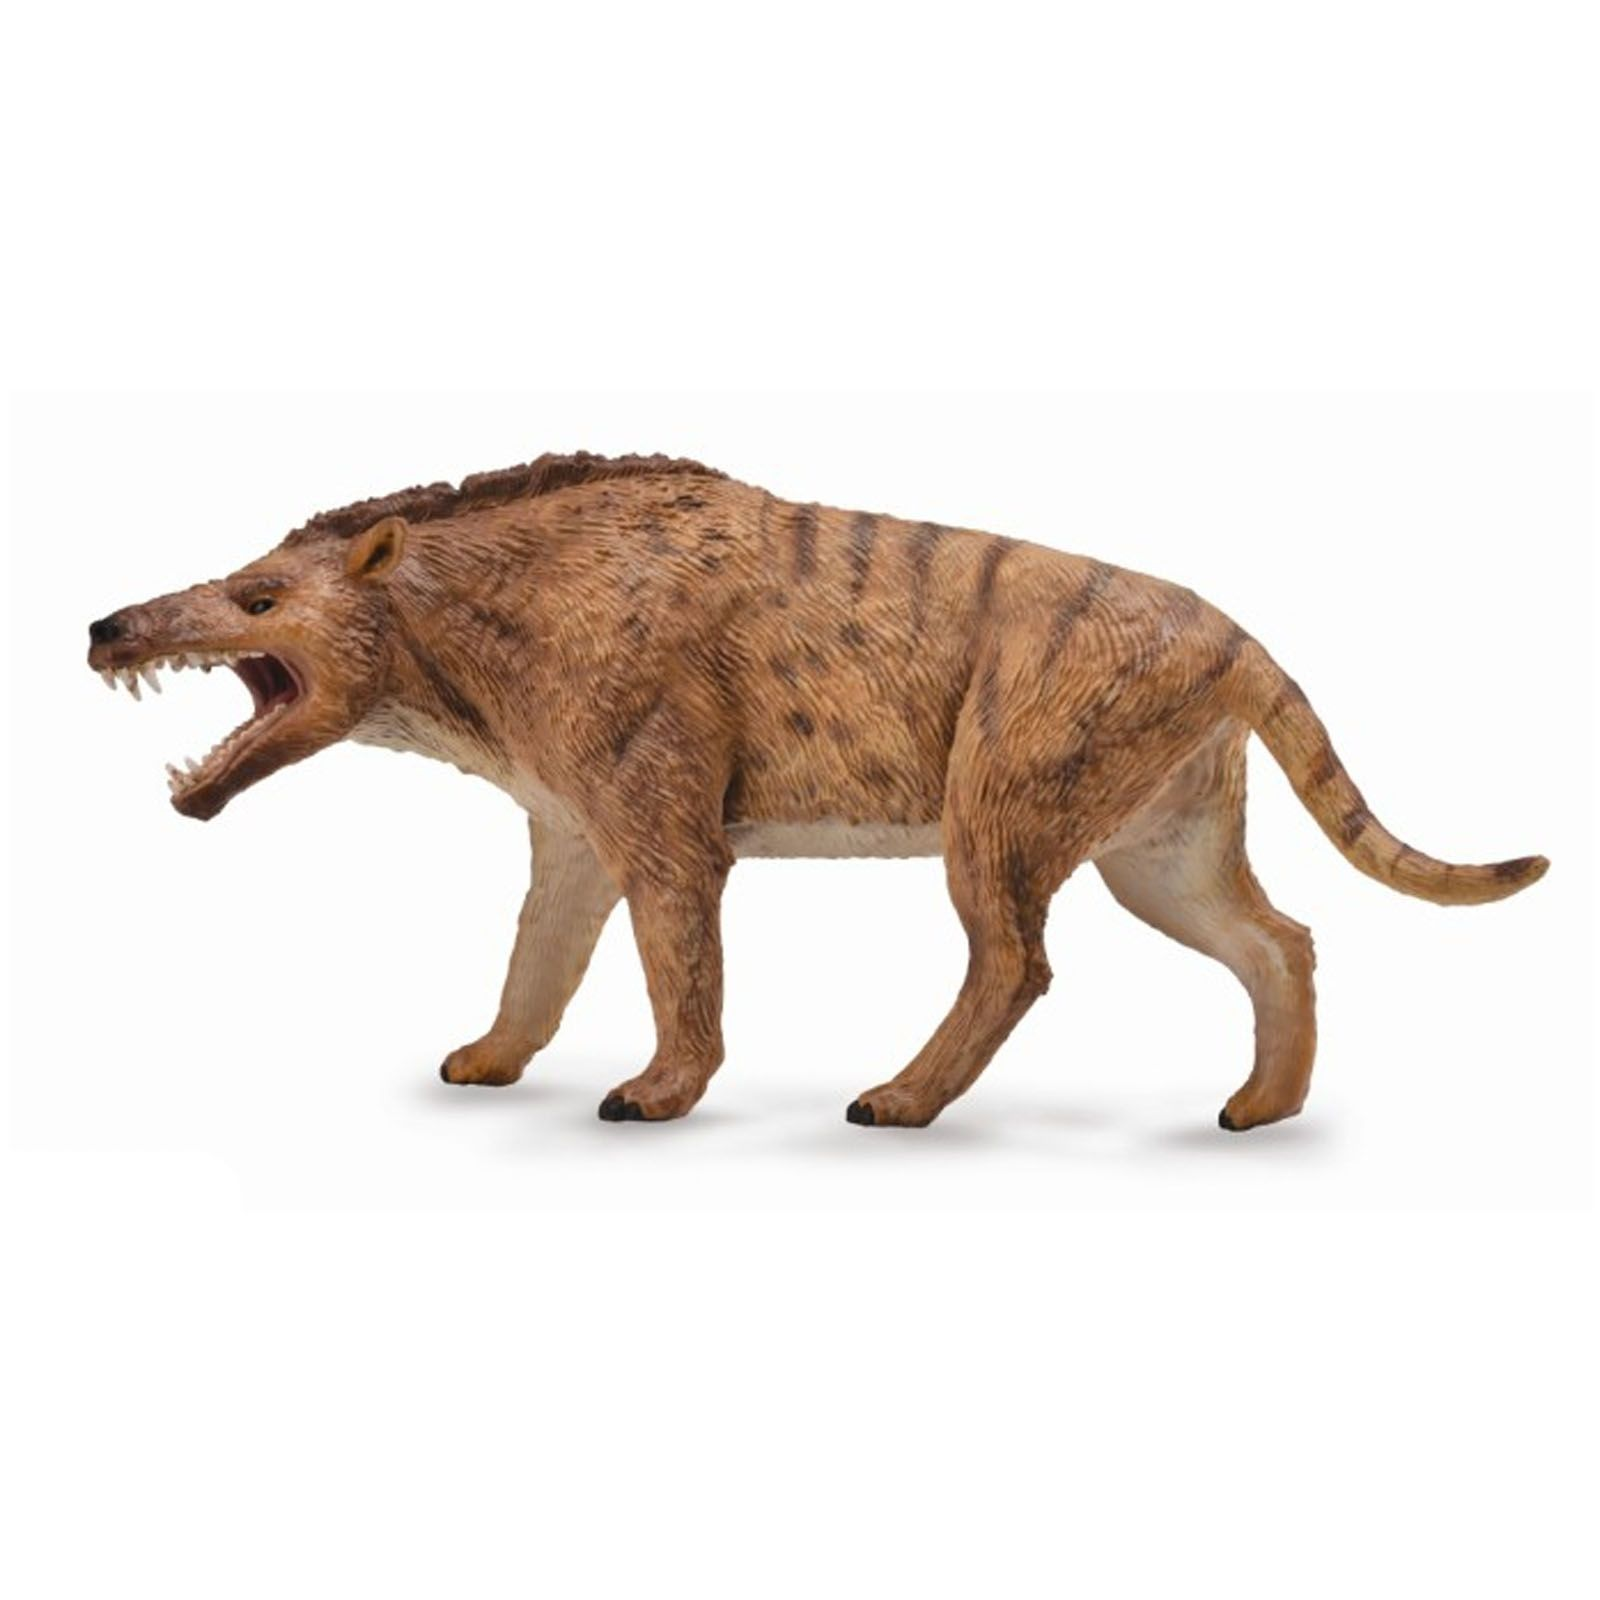 "Фигурка животного ""Эндрюсарх"", длина 19.5 см"